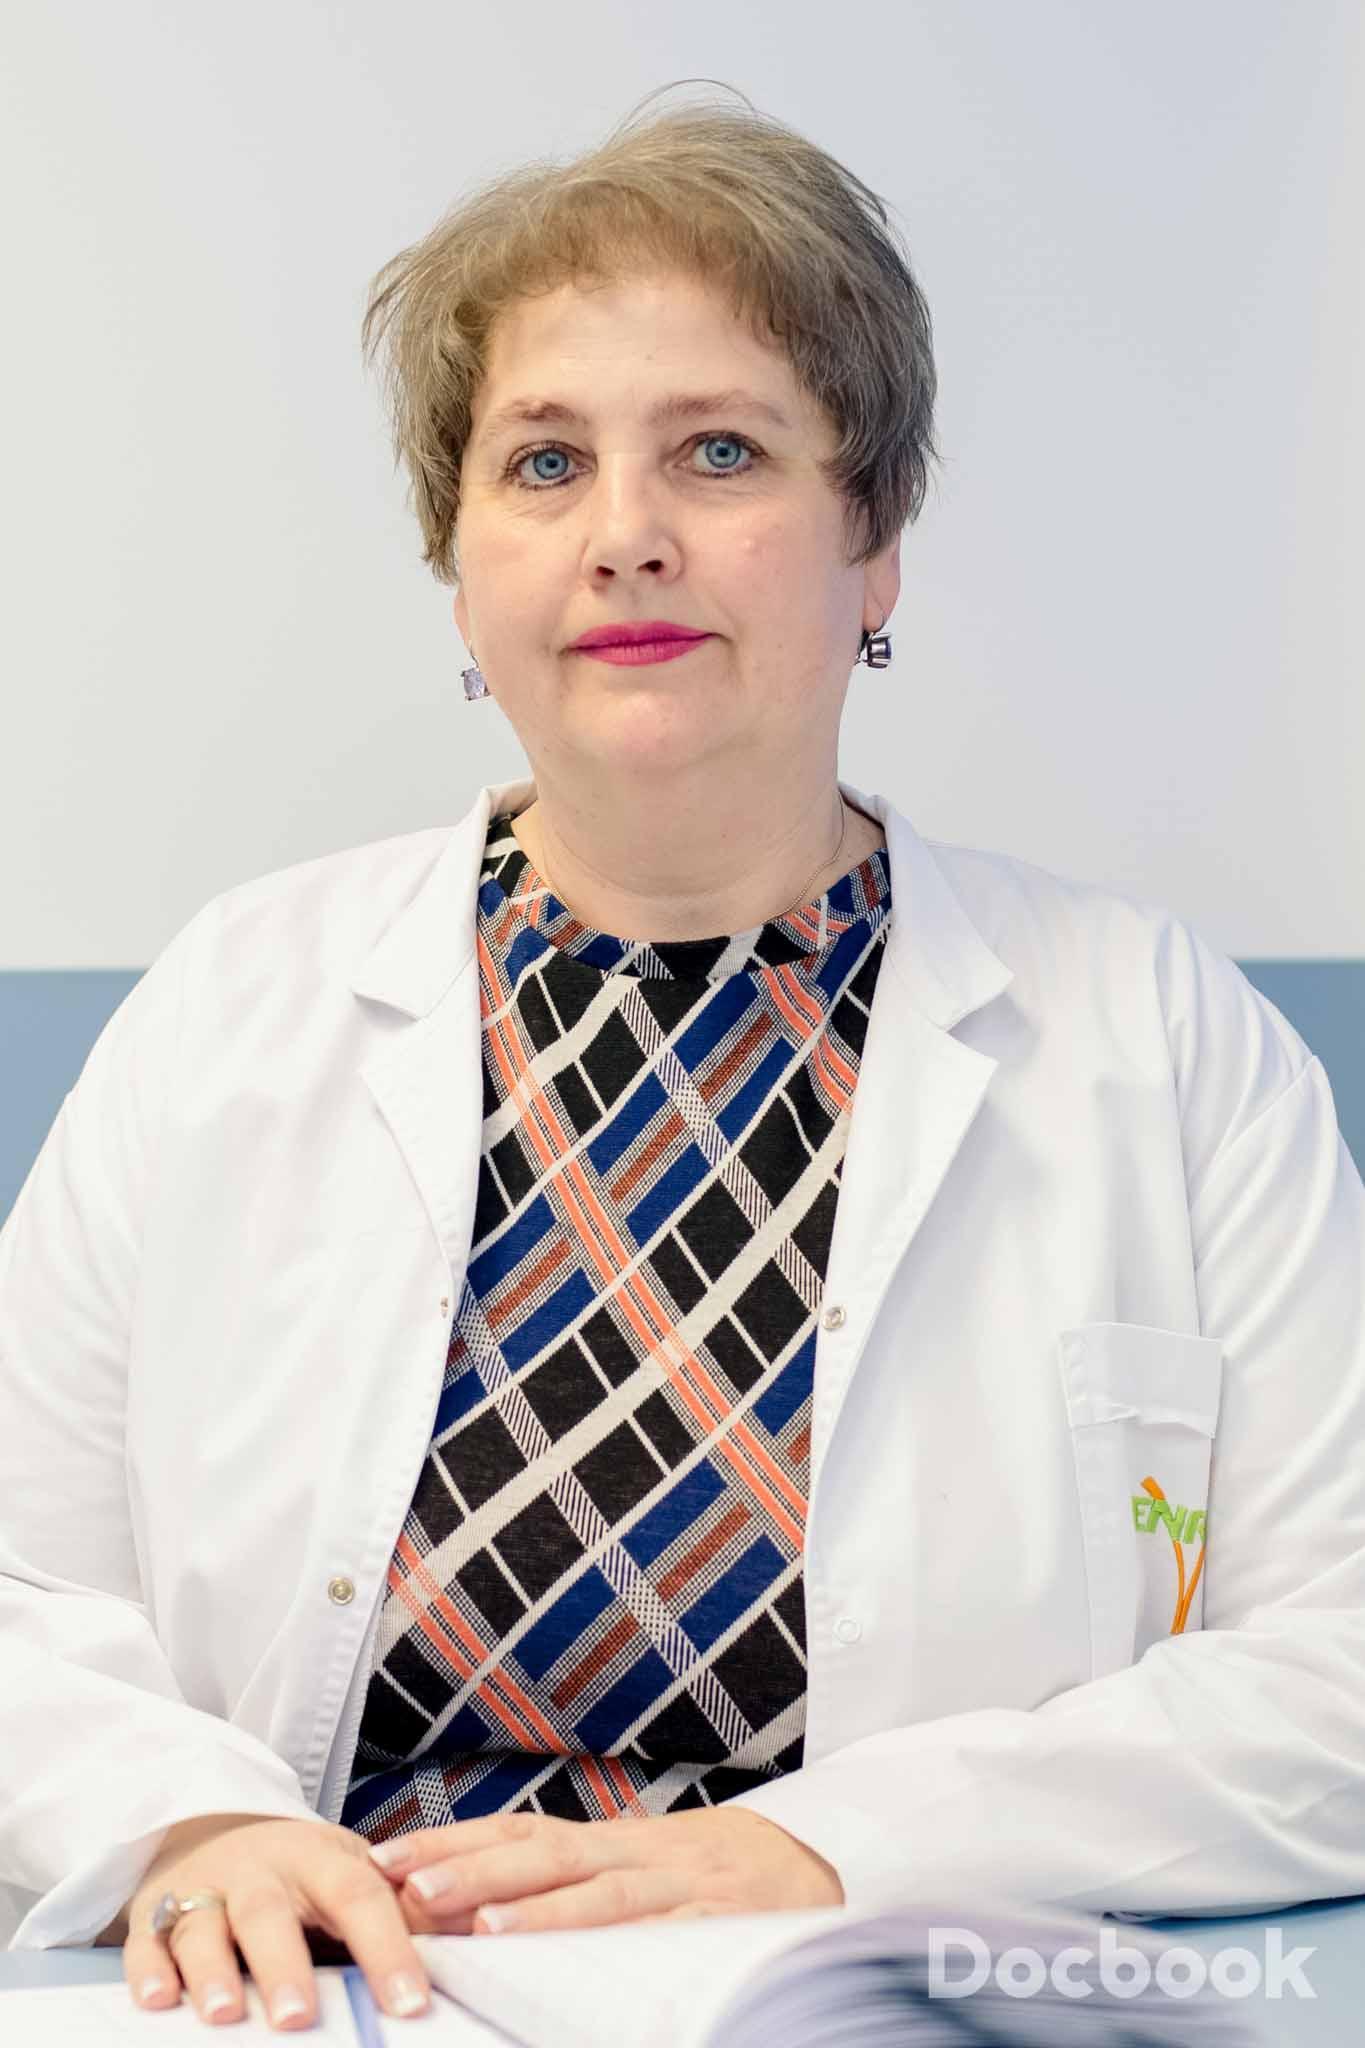 Dr. Daniela Bnayat